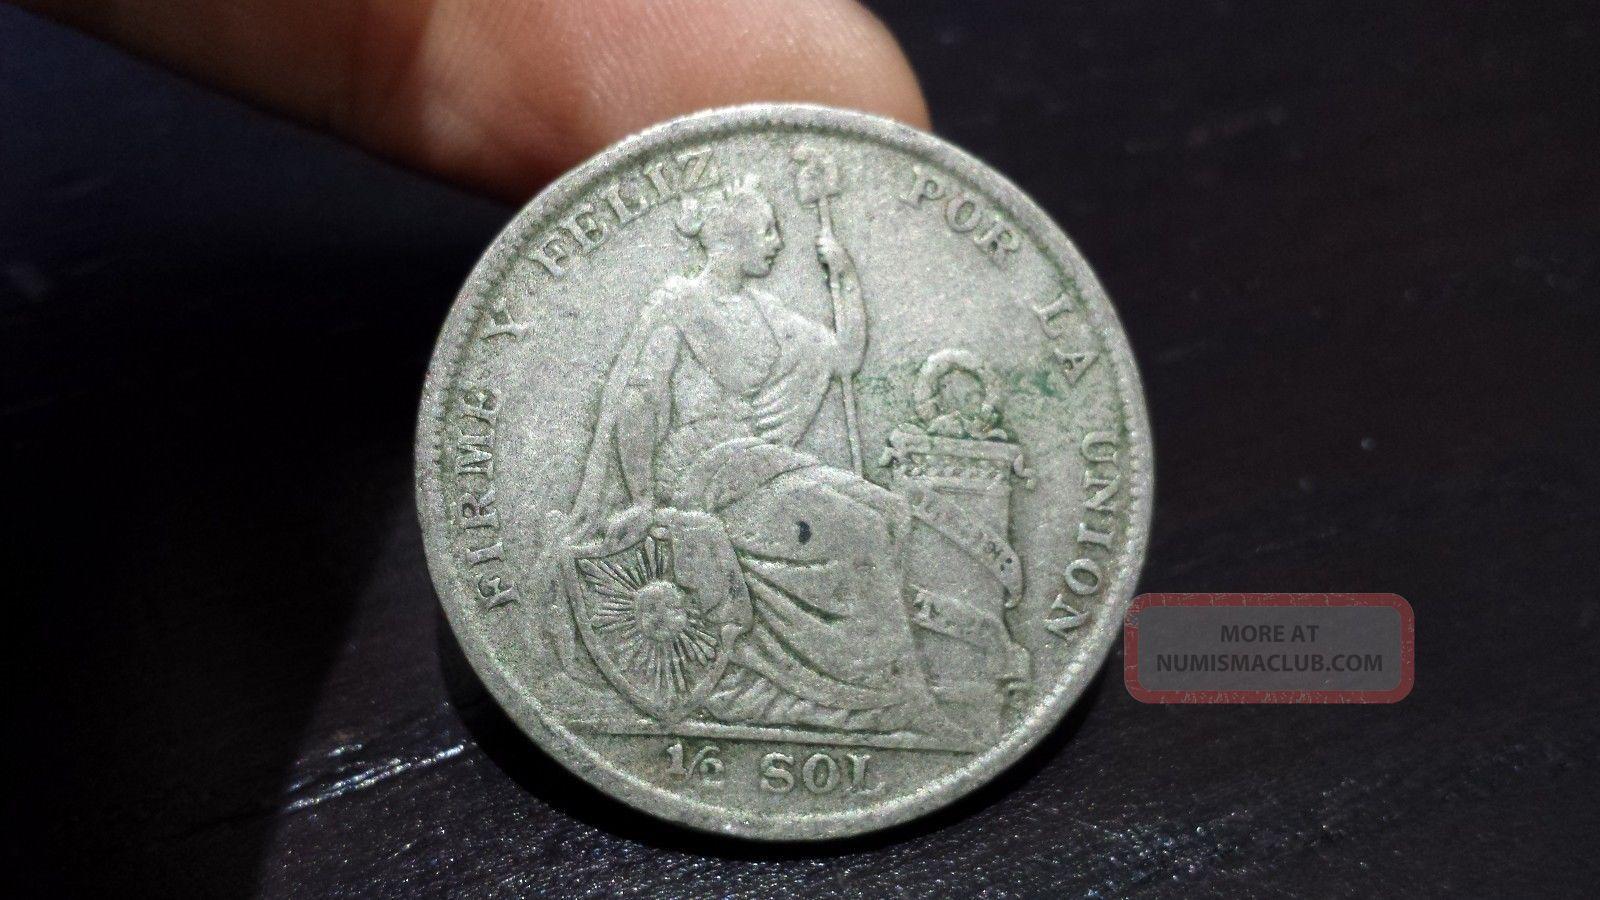 1927 Peru Half Unsol Very Low Km 216 Silver Coin South America photo